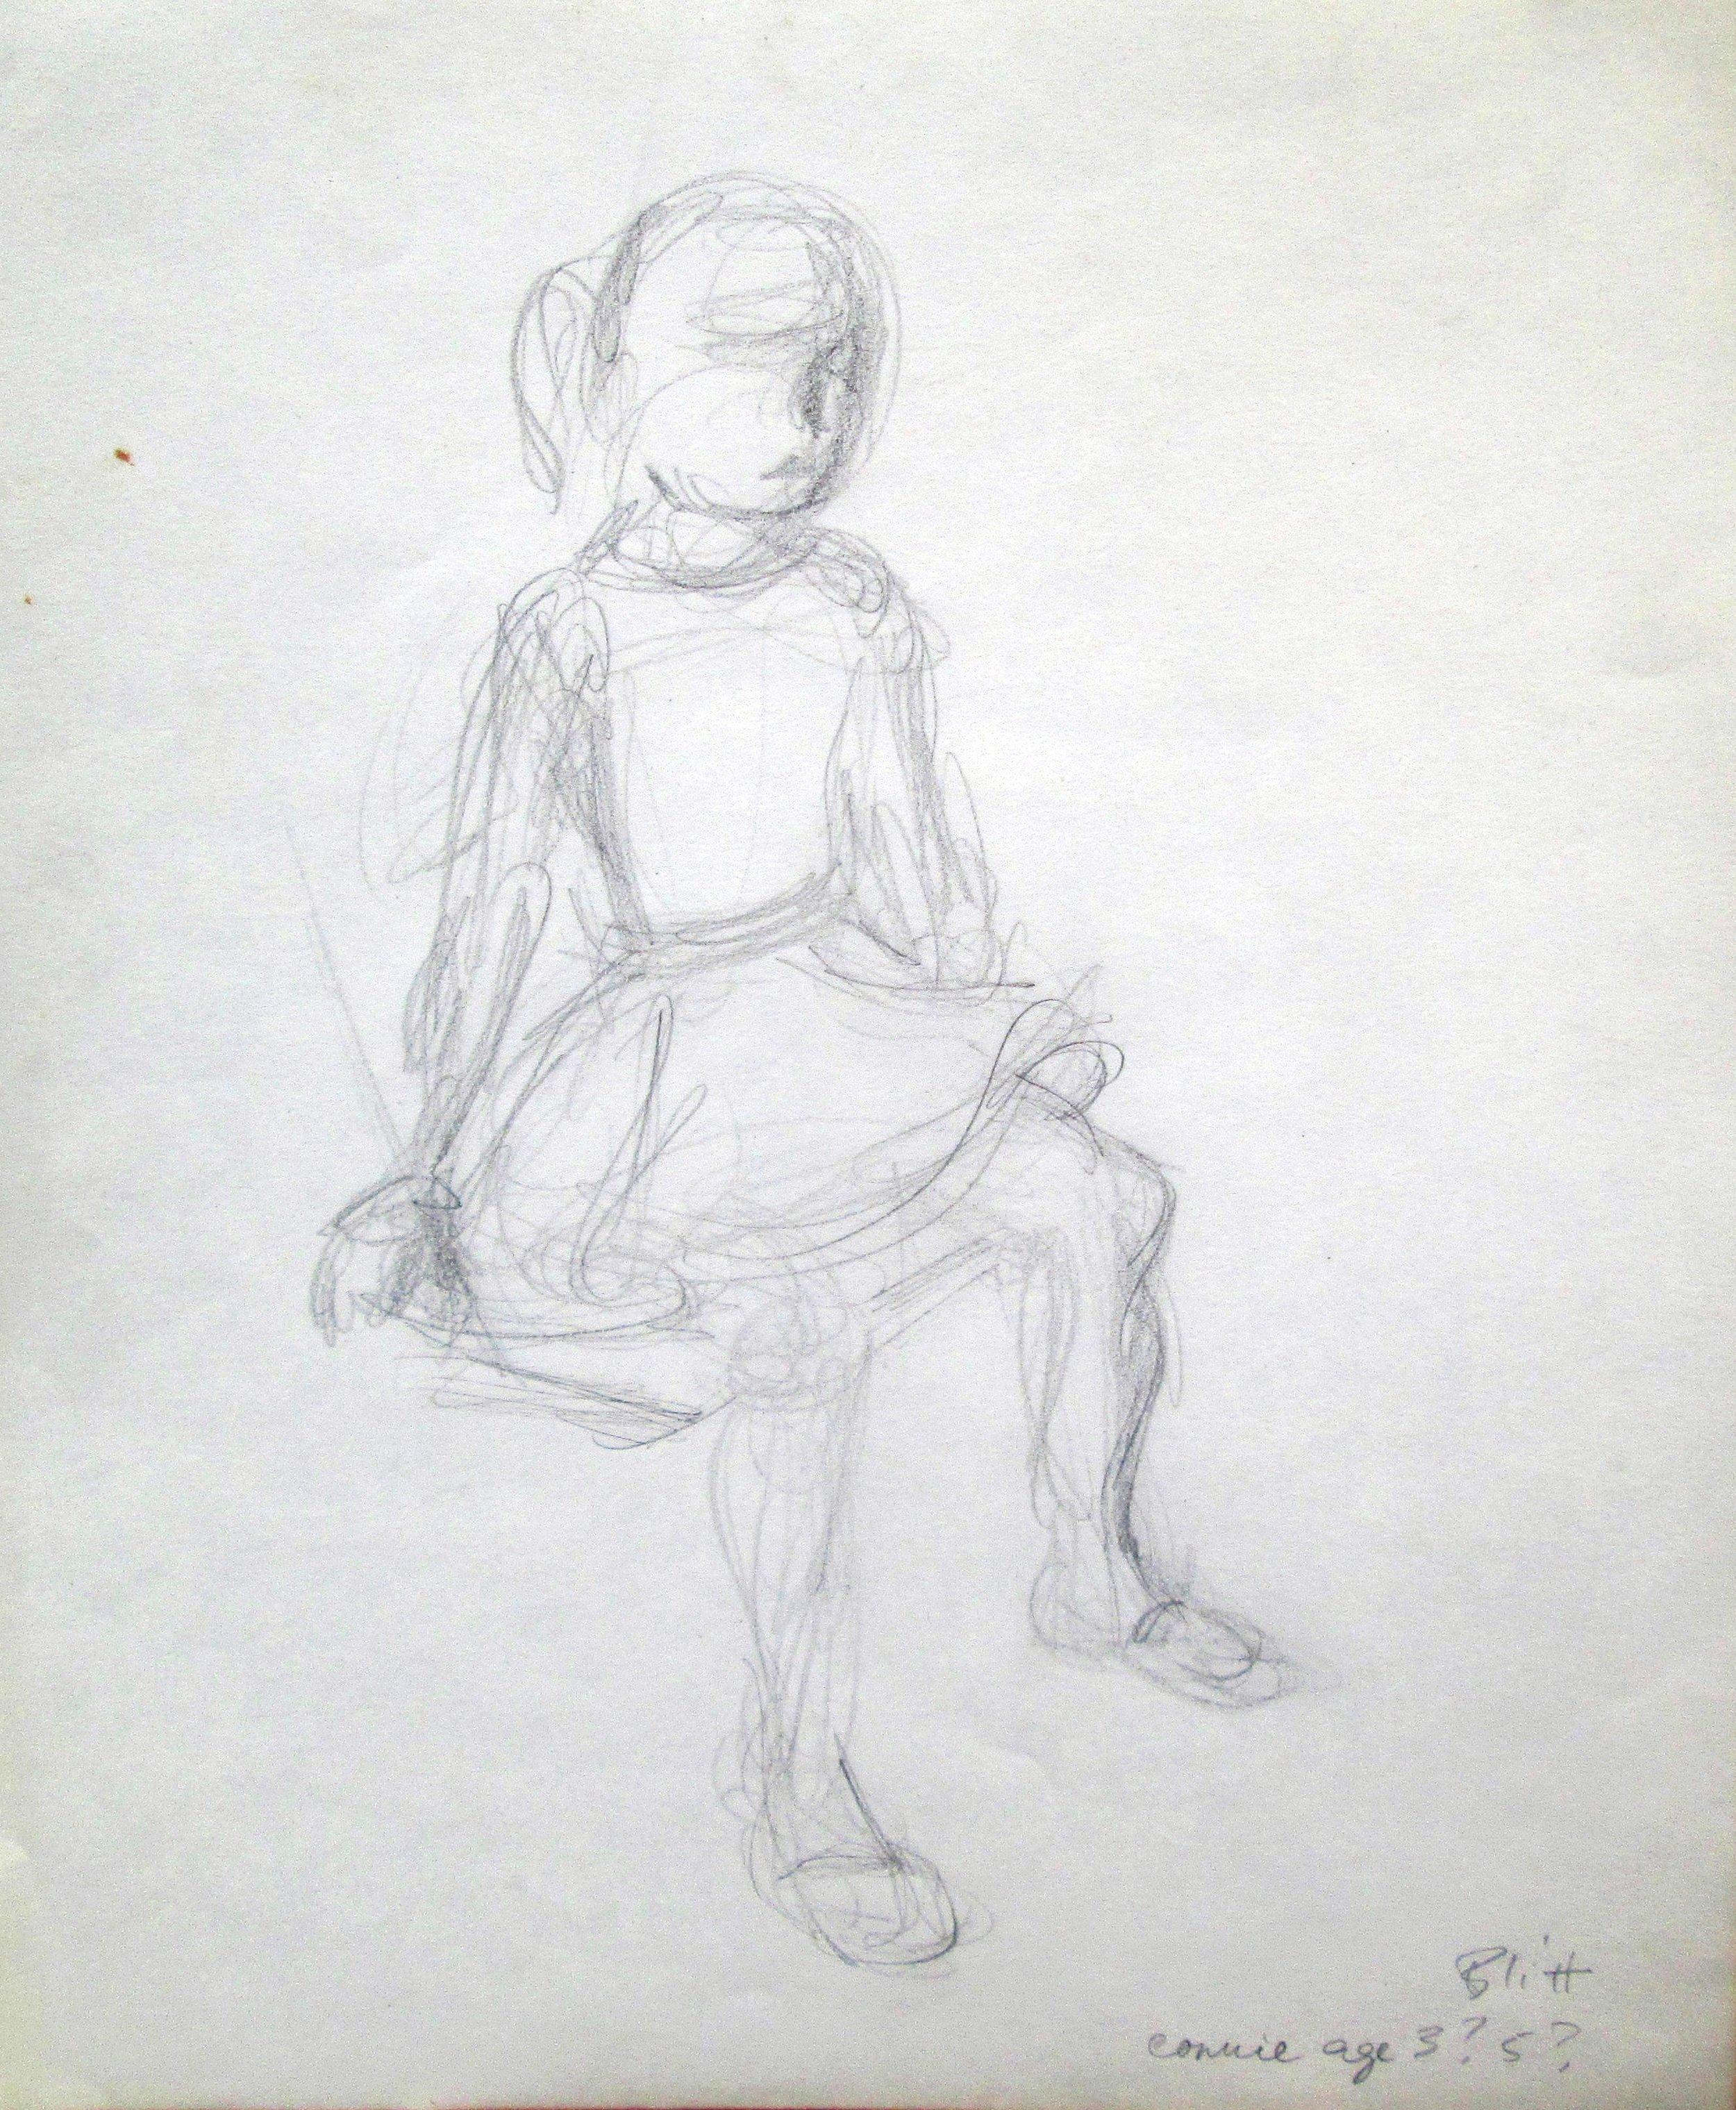 Connie Chela  1958, pencil on paper, 14x11 in